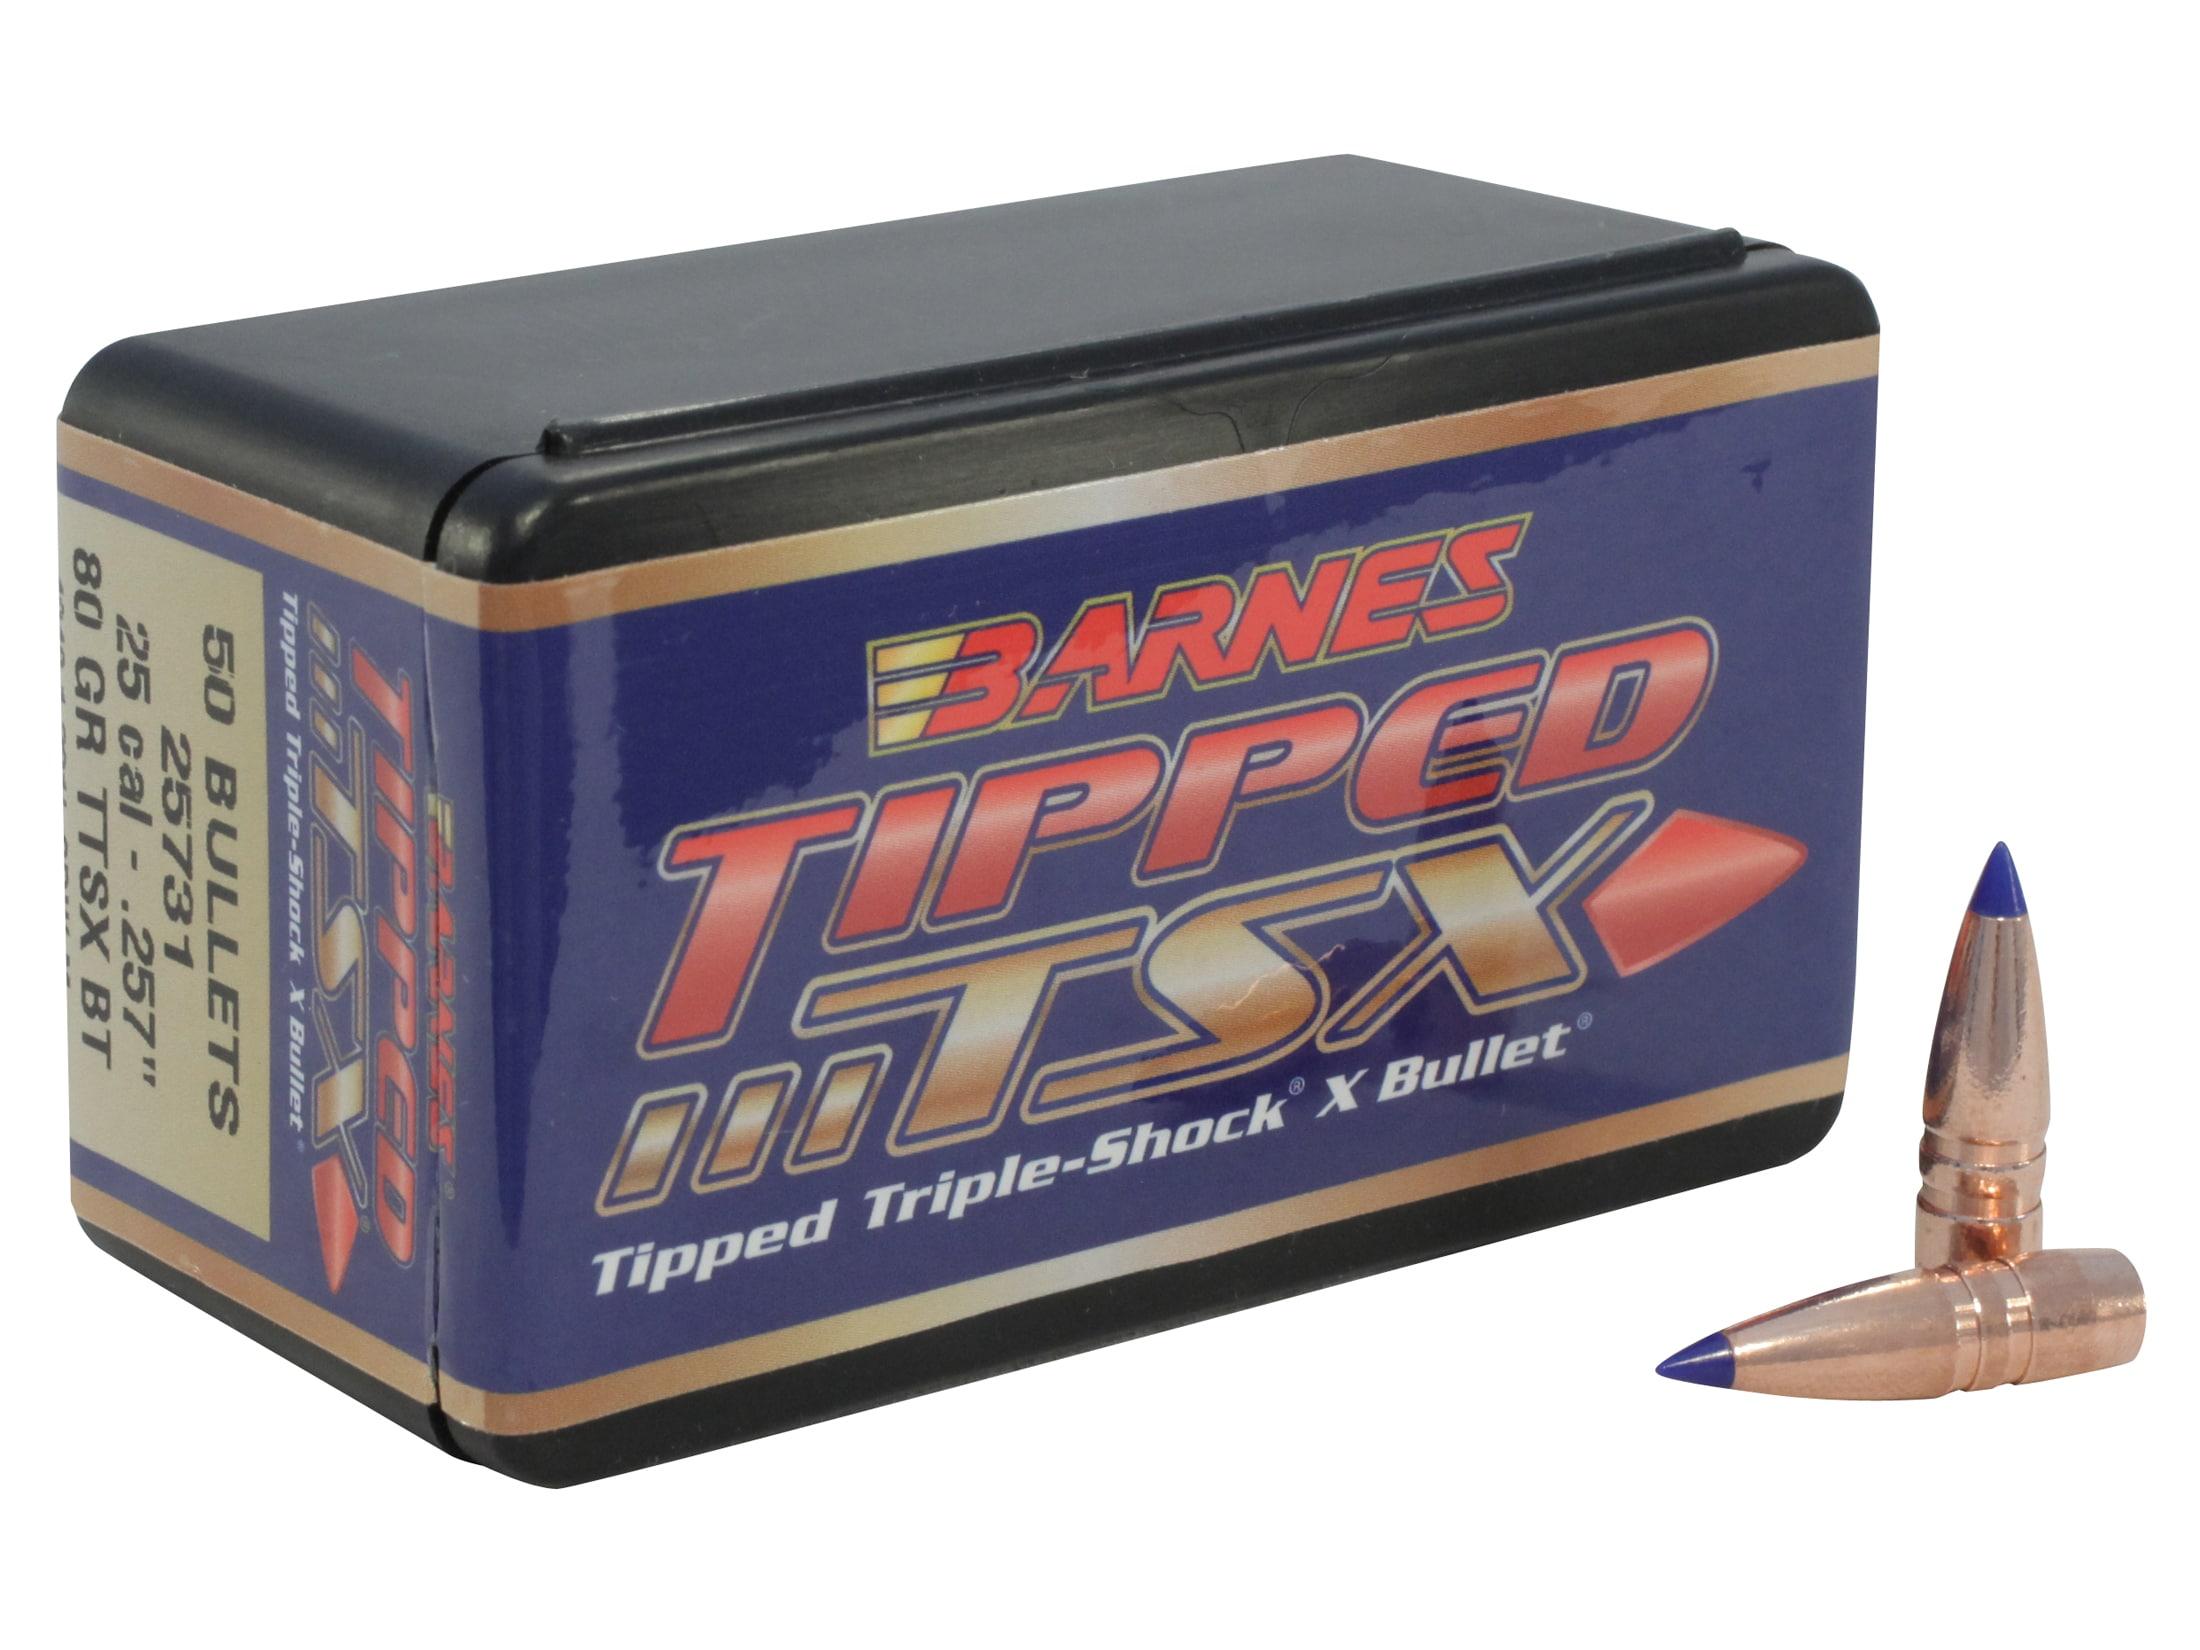 Barnes Tipped Triple-Shock X (TTSX) Bullets 25 Cal (257 ...